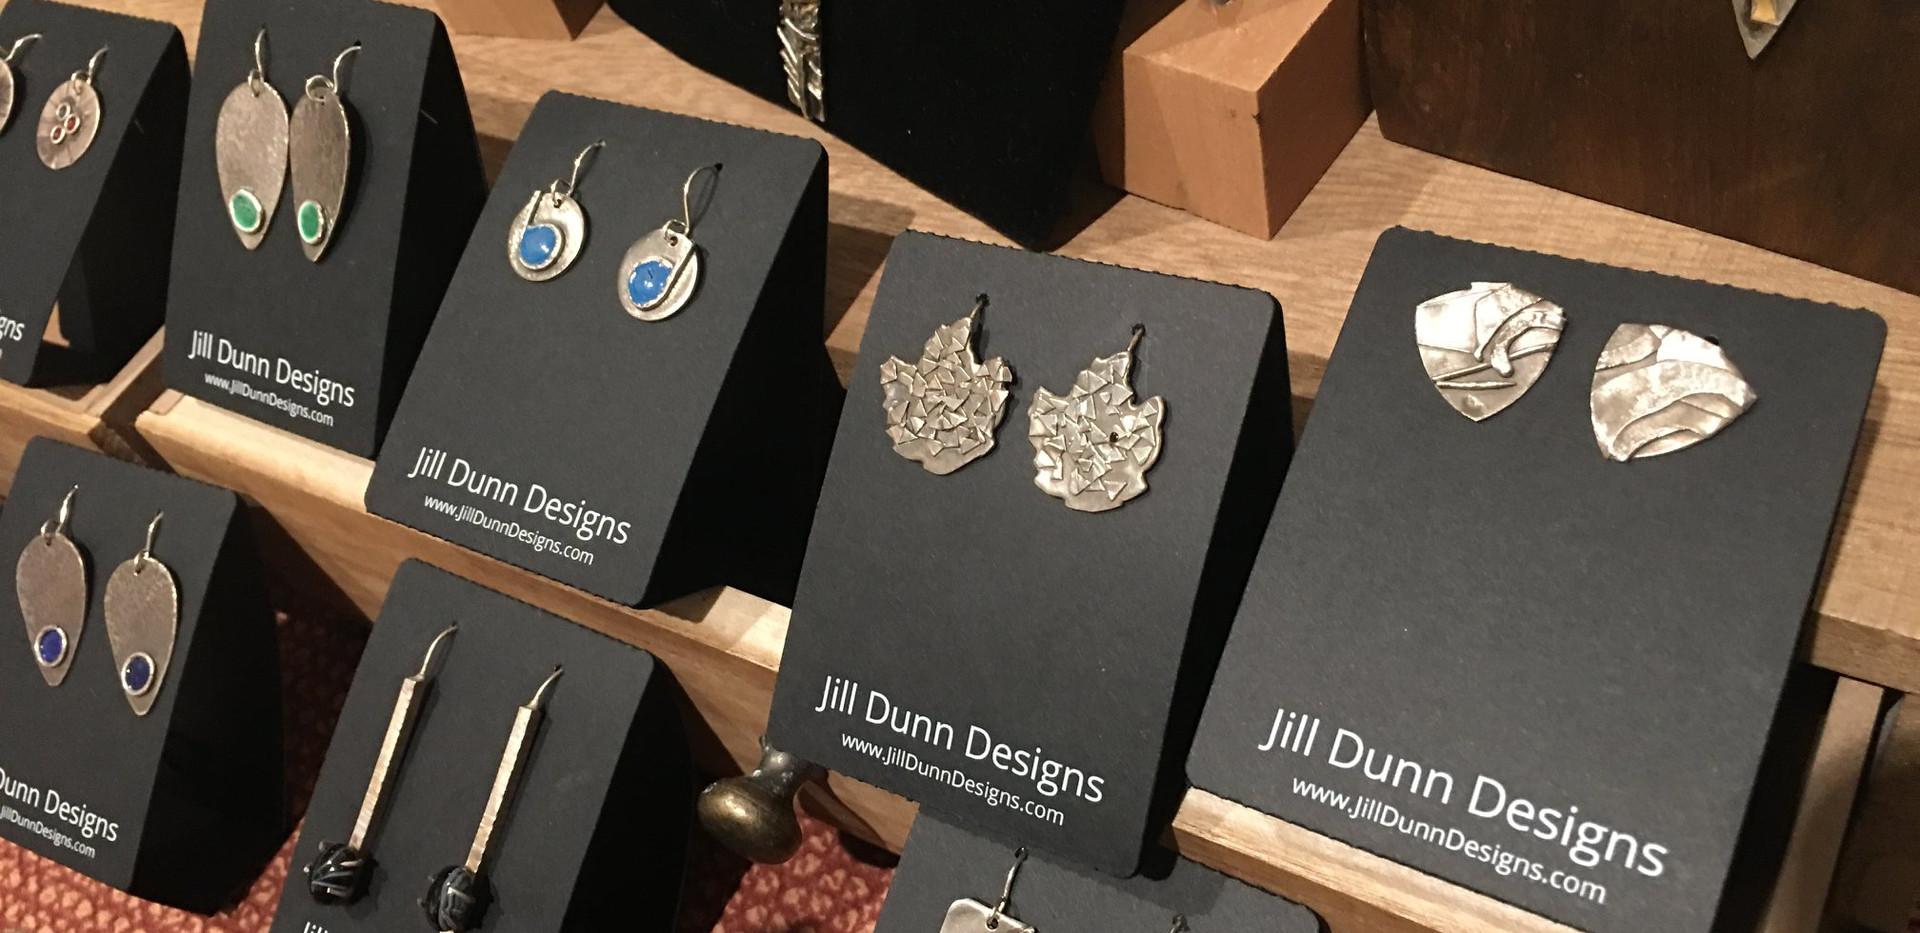 The Venue Jill Dunn Designs - Robert Car